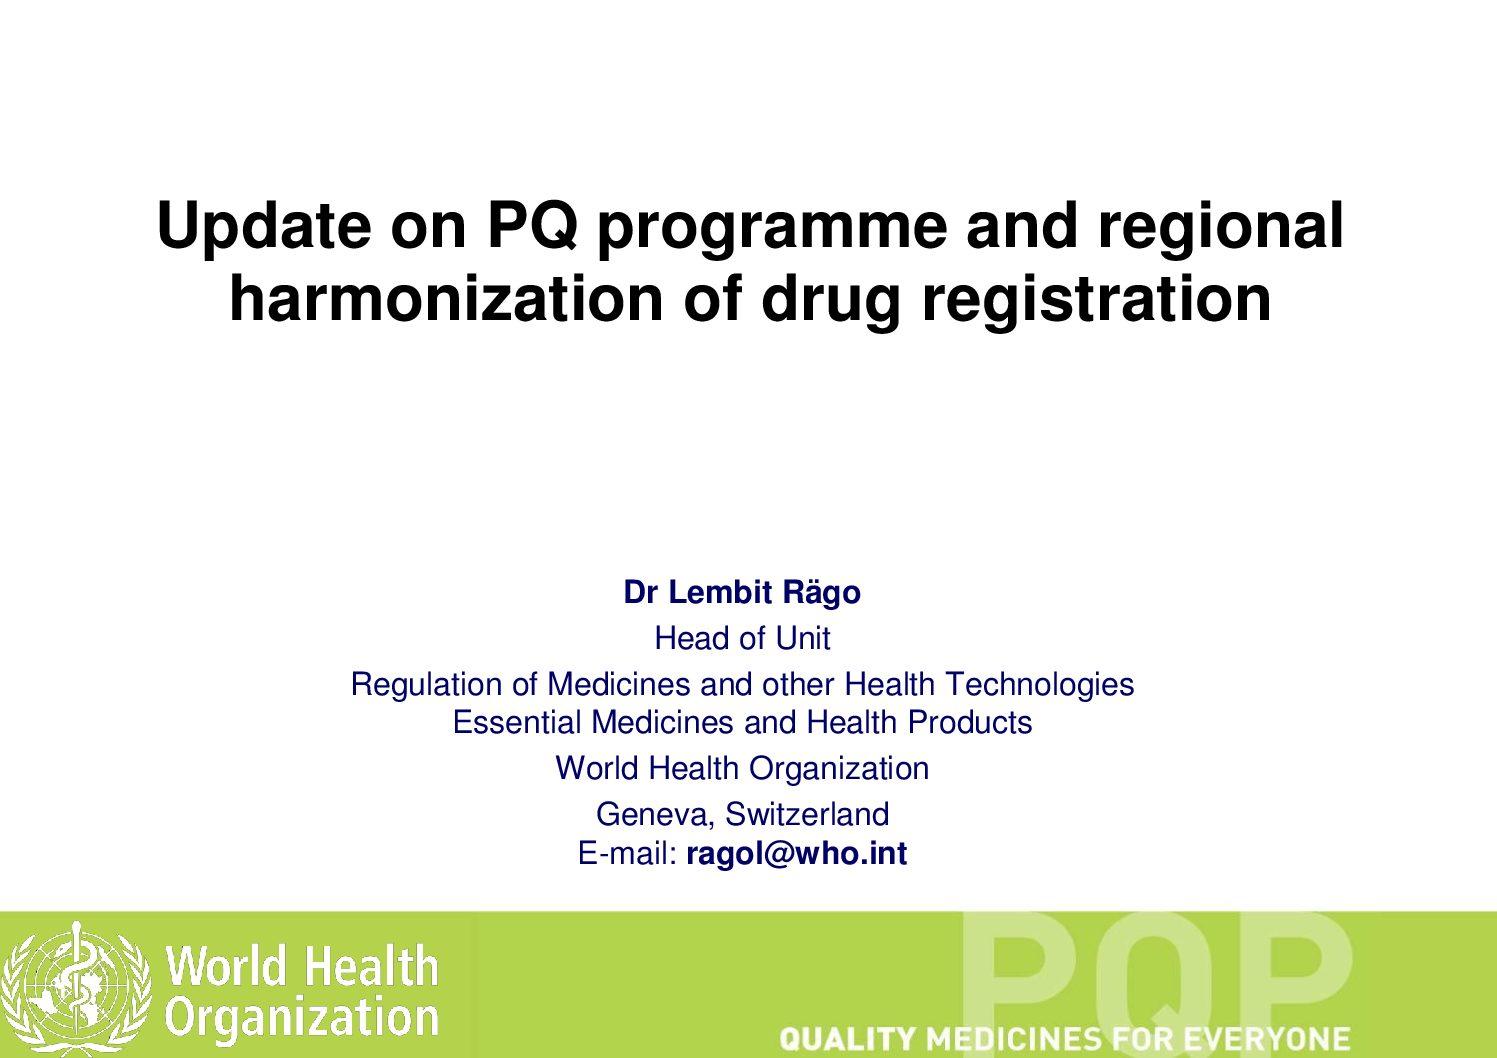 Update on PQ programme and regional harmonization of drug registration 2015.